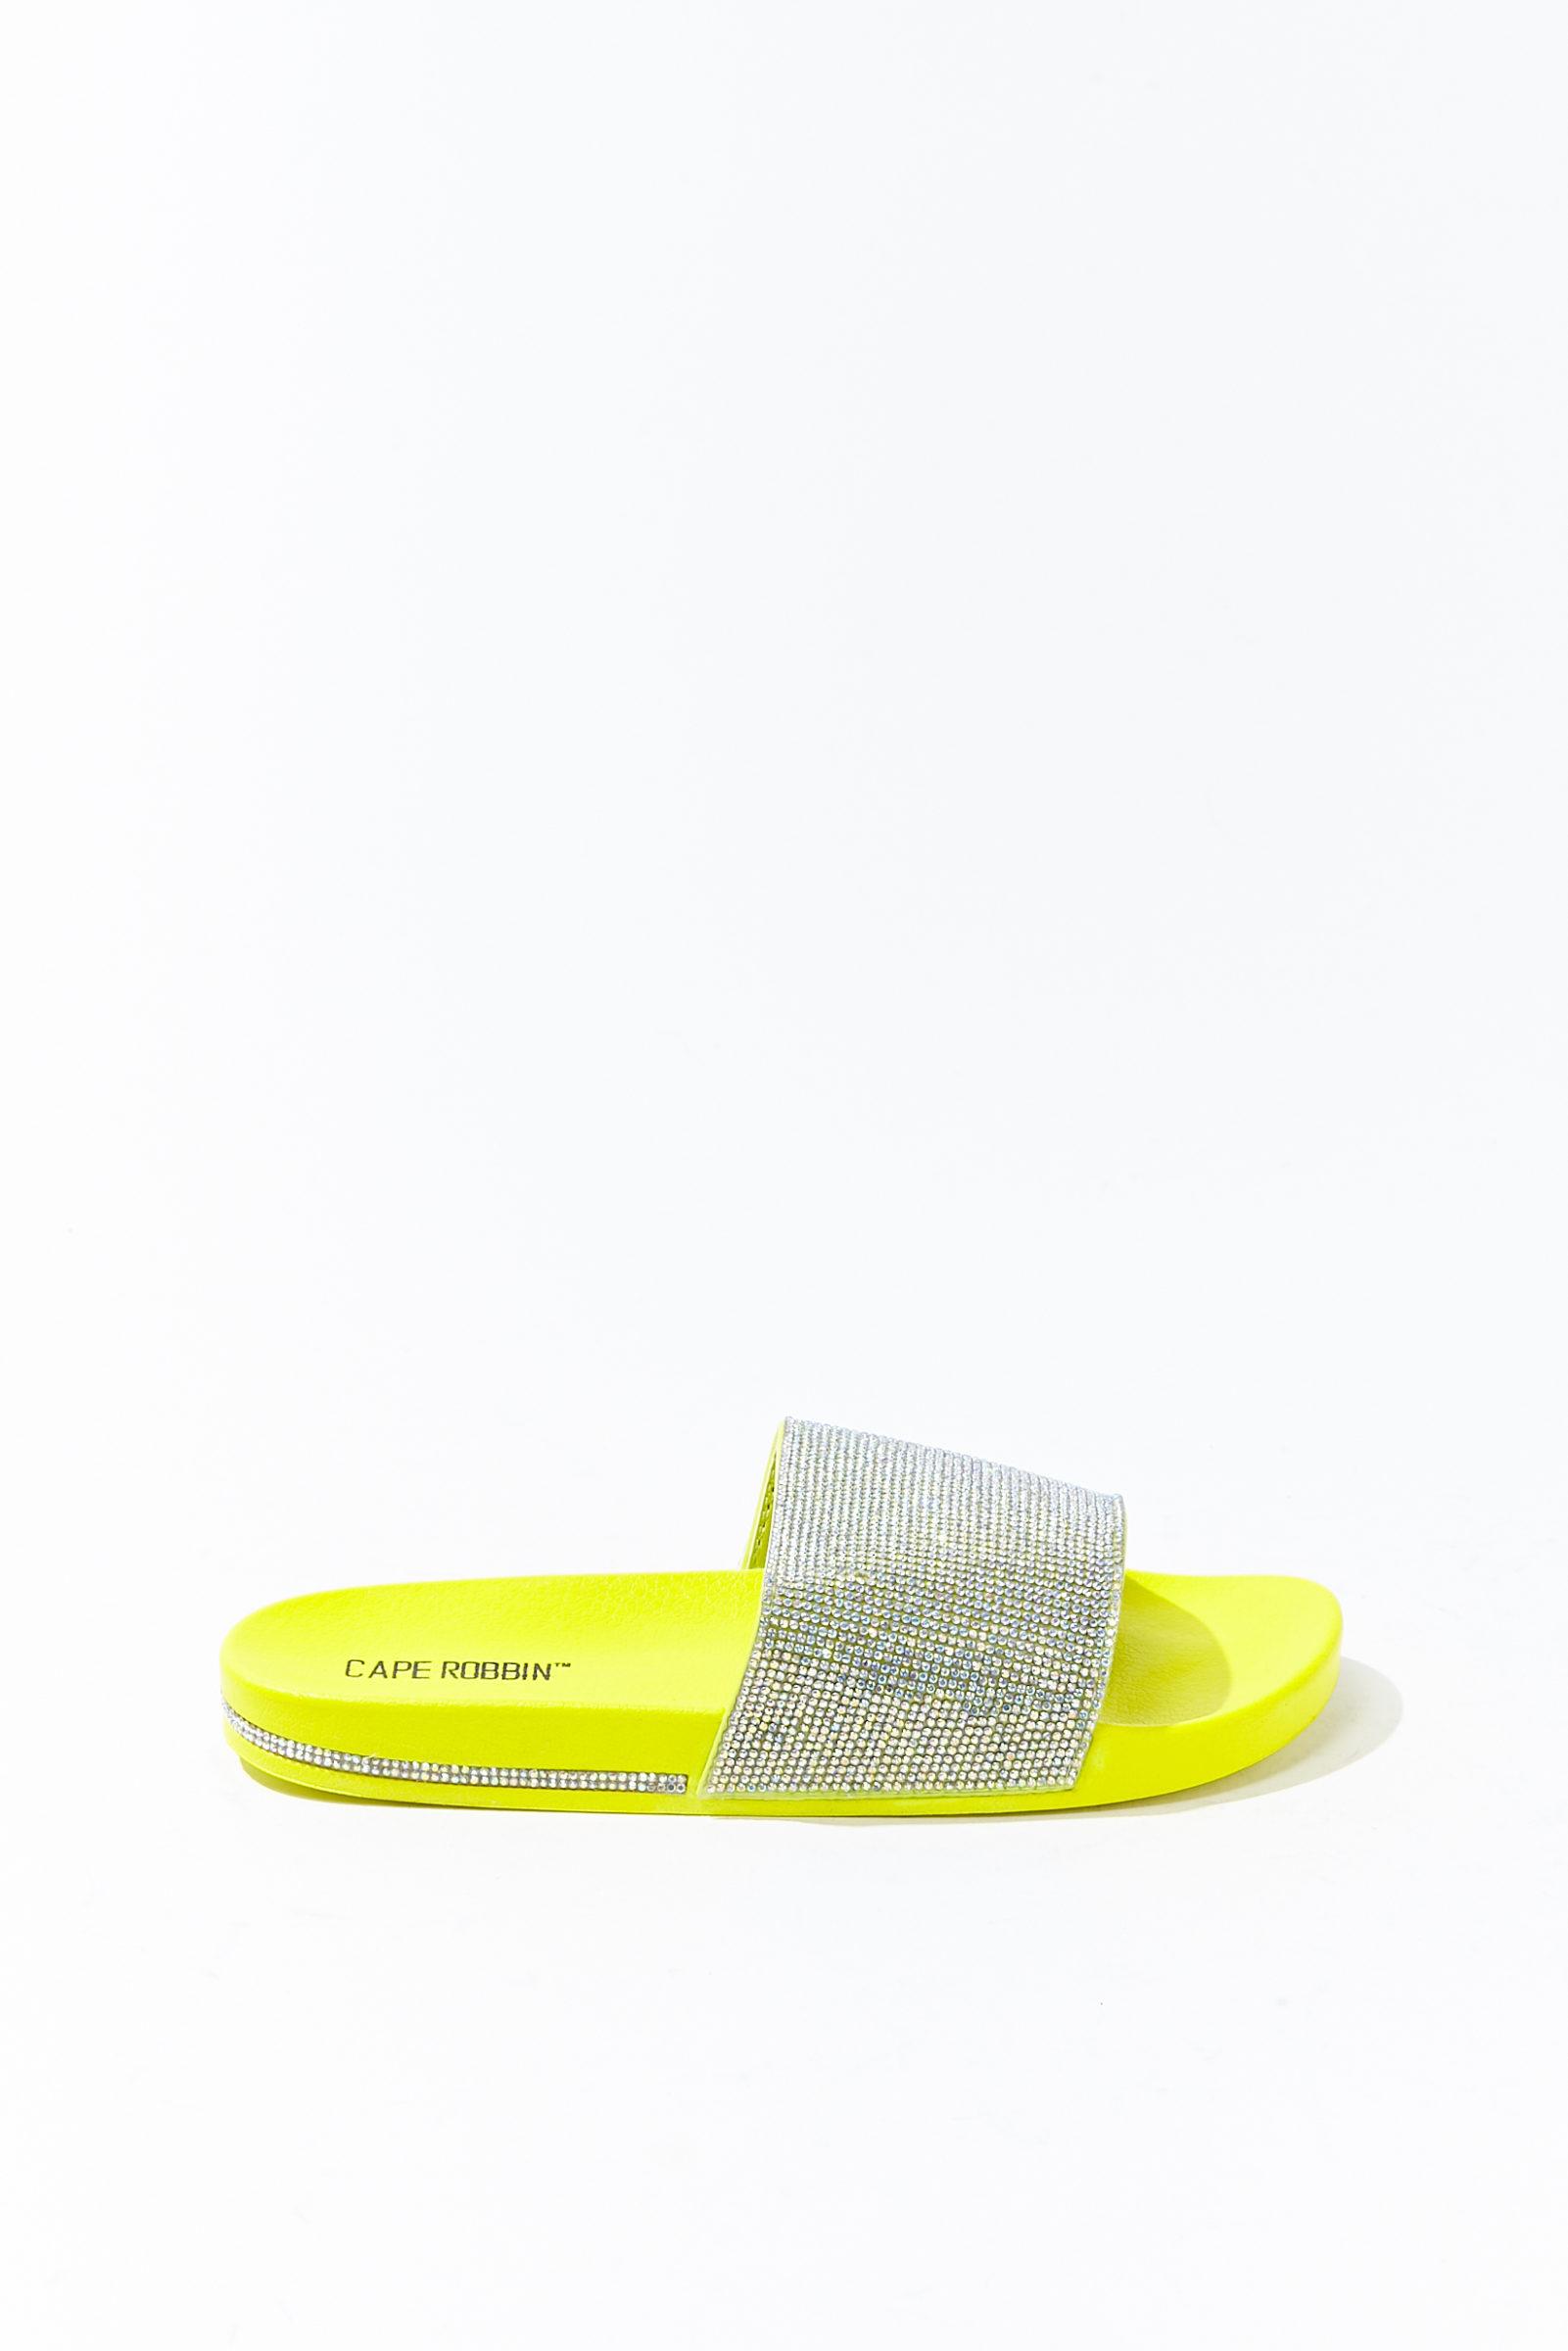 Bright yellow sandals